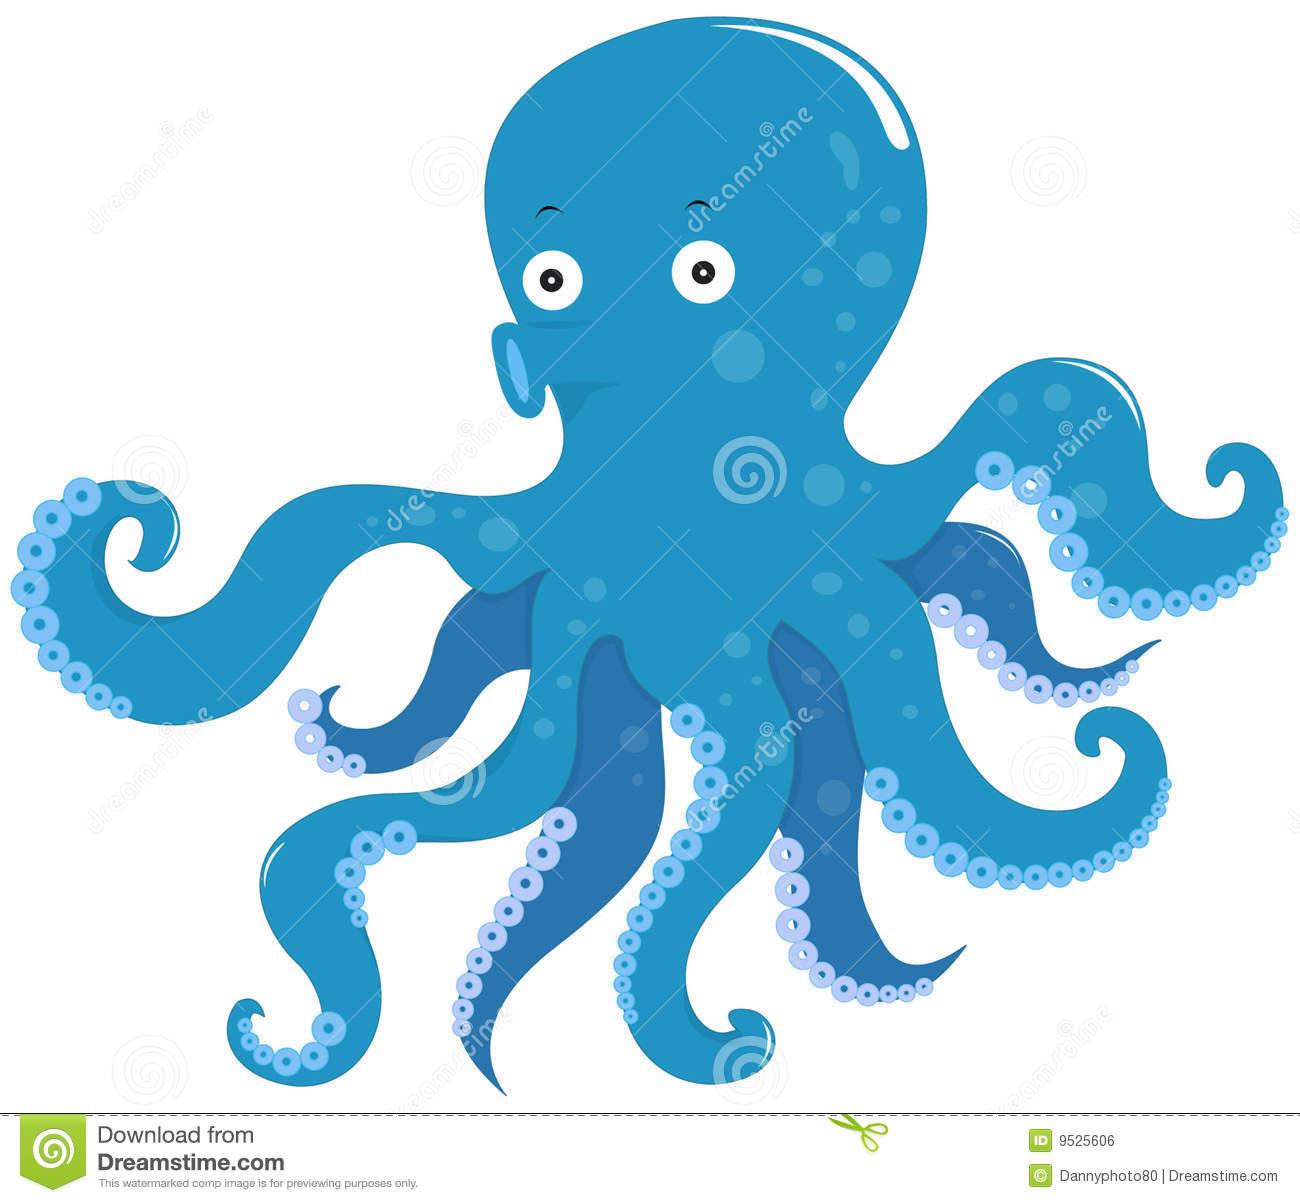 Blue octopus clipart.